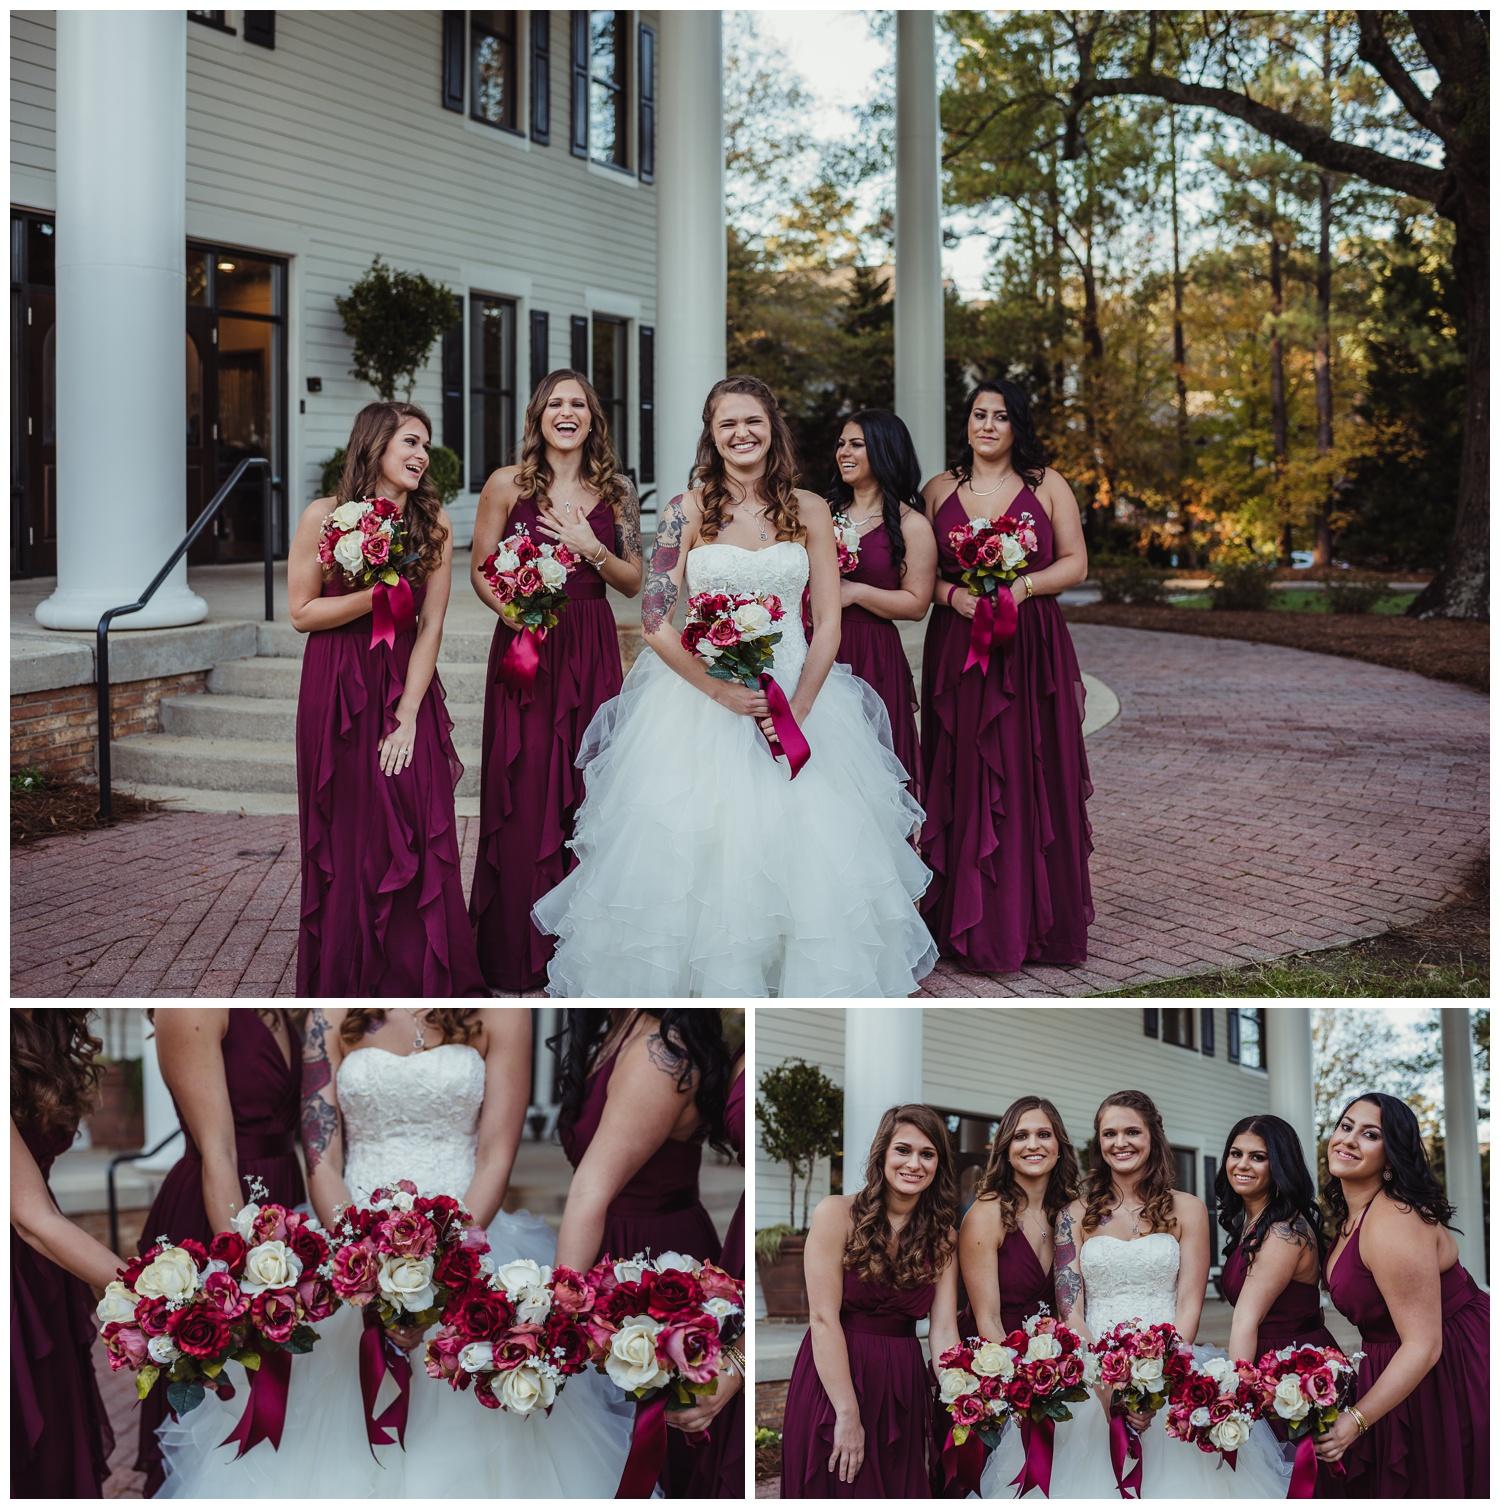 raleigh-wedding-photographer-1705-east-davids-bridal-portraits-caitlyn-and-evan_0001.jpg